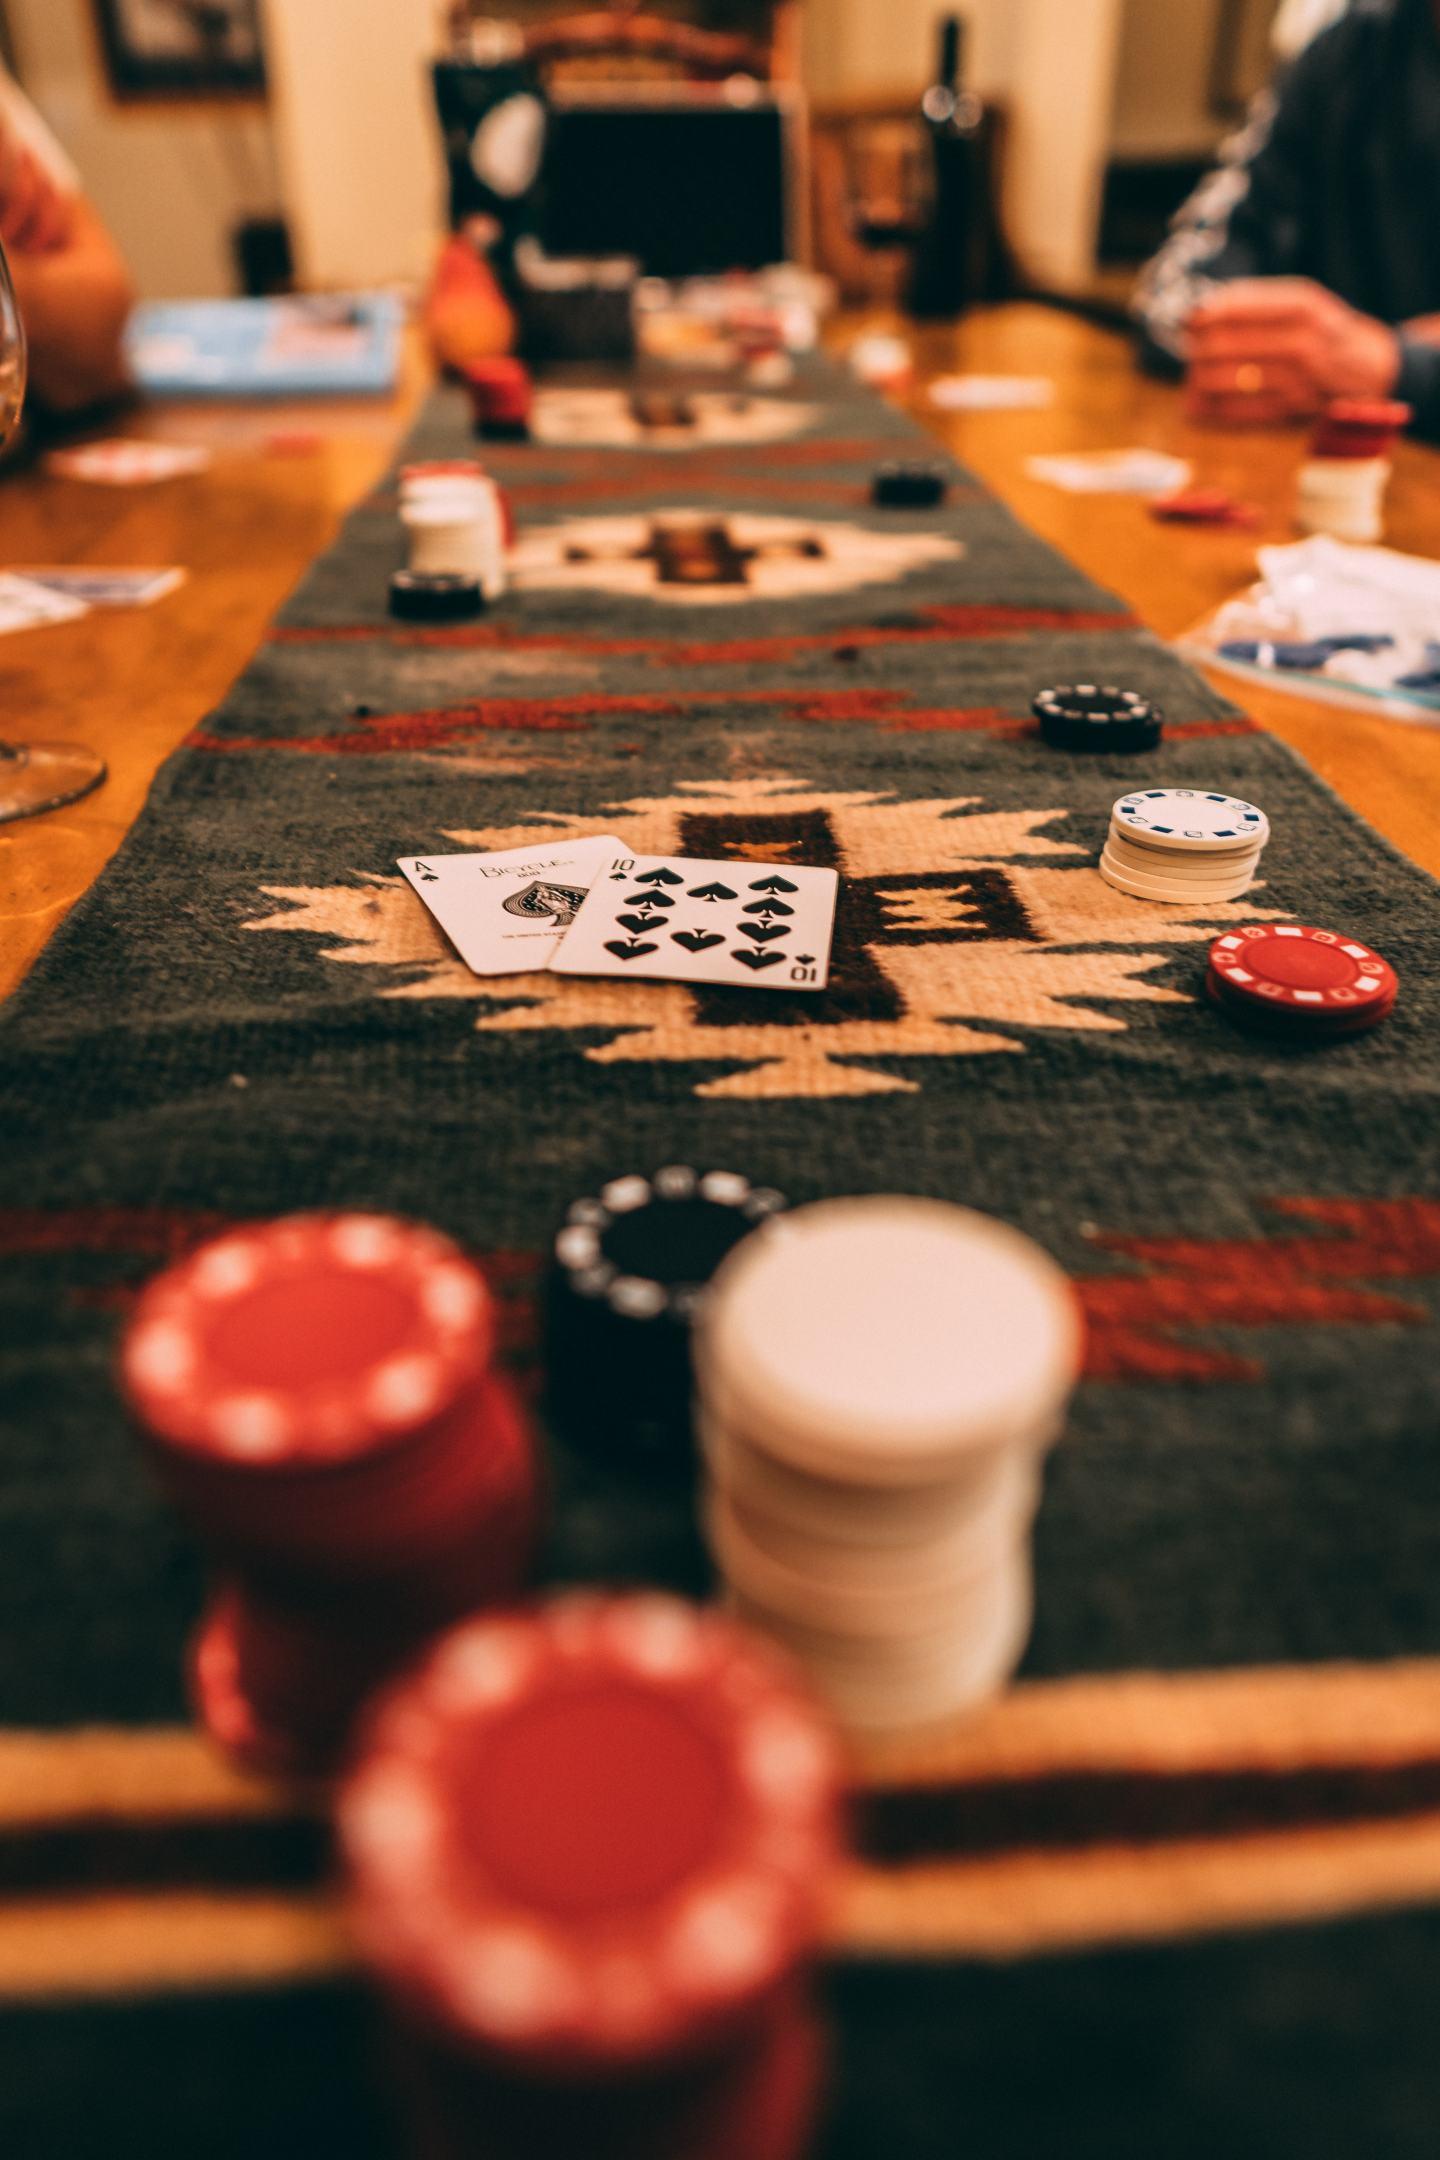 How to win online blackjack reddit